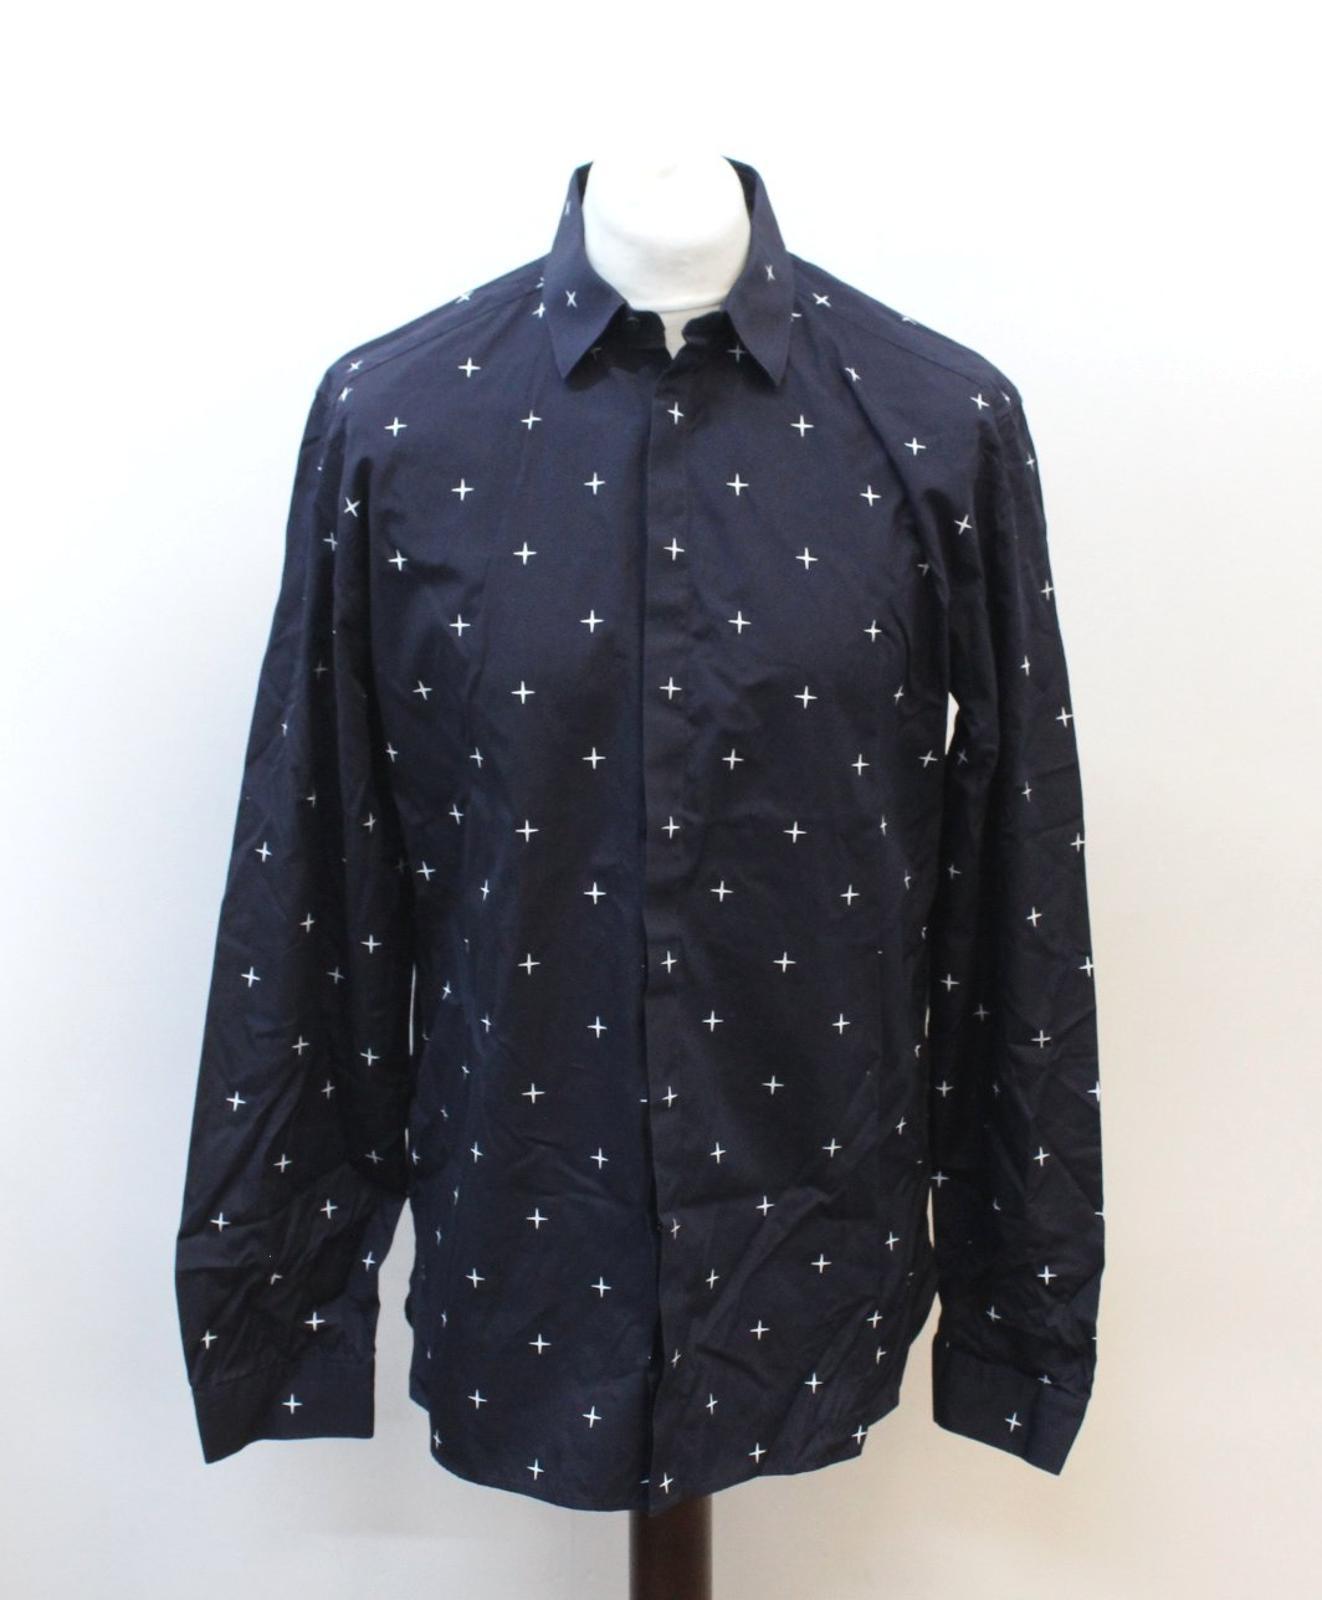 Neil-Barrett-Hombre-Azul-Marino-Blanco-Cuello-De-Camisa-formal-calce-Cruz-16-5-034-42cm miniatura 2